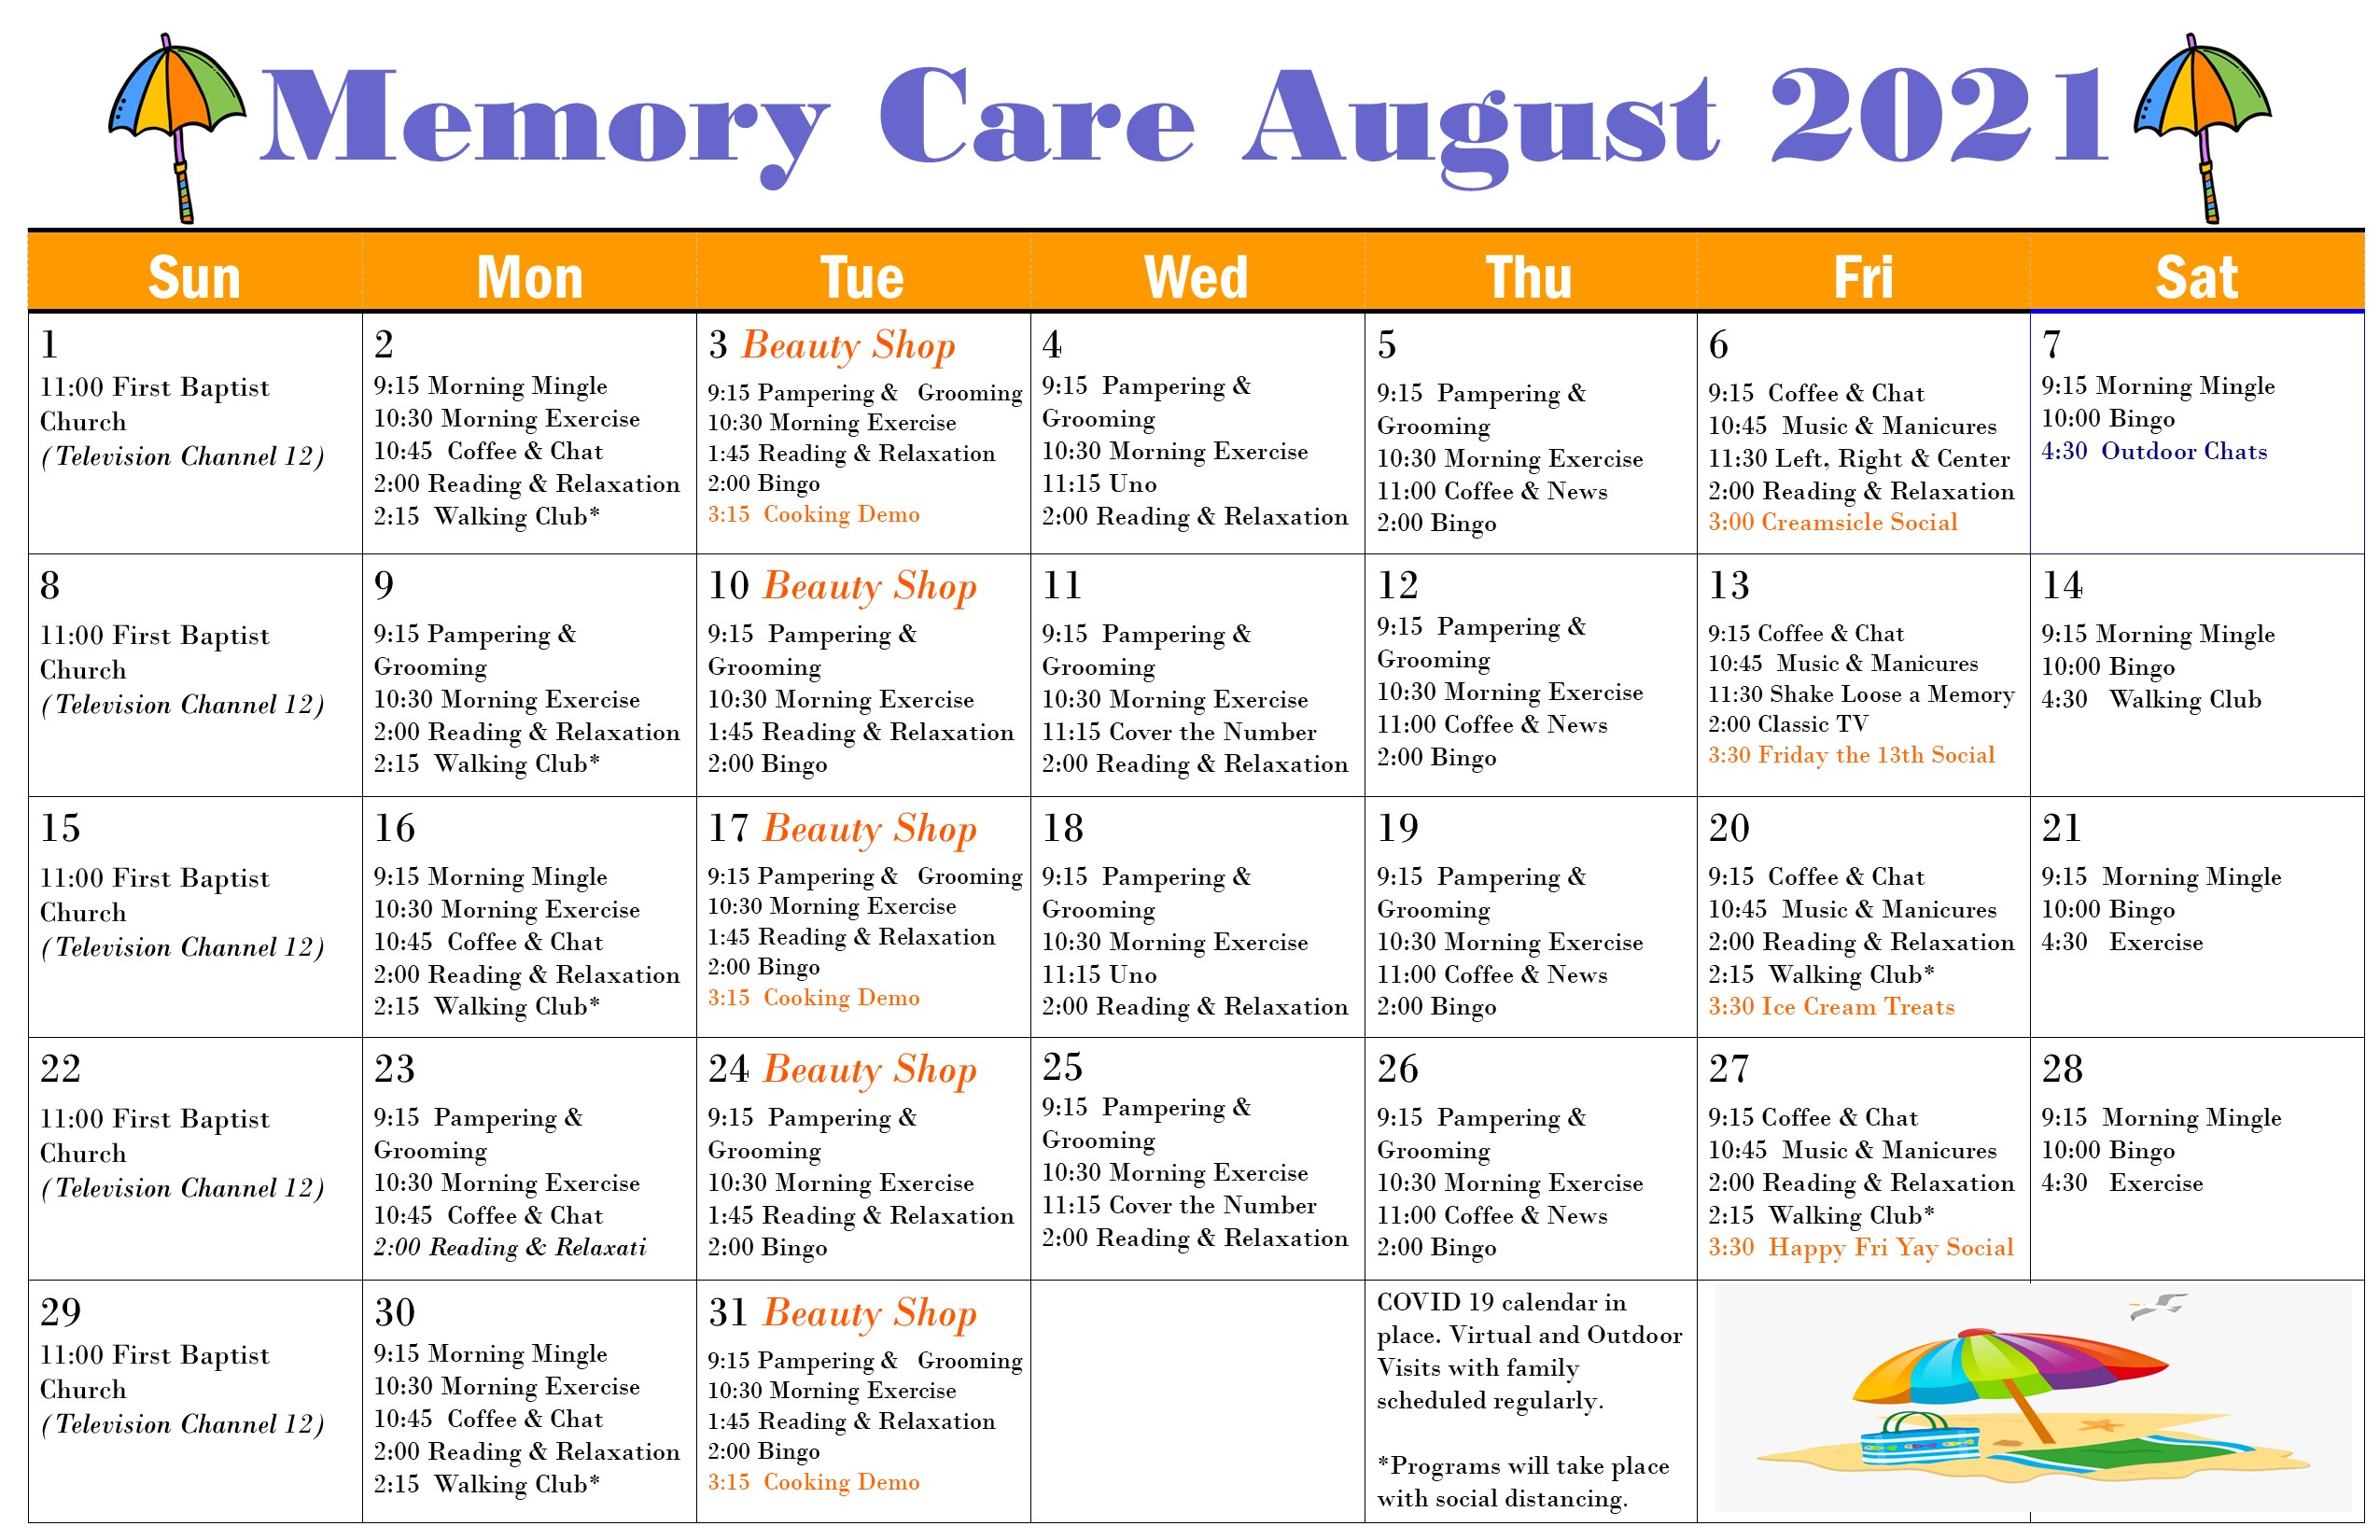 Memory Care August 2021 Events Calendar